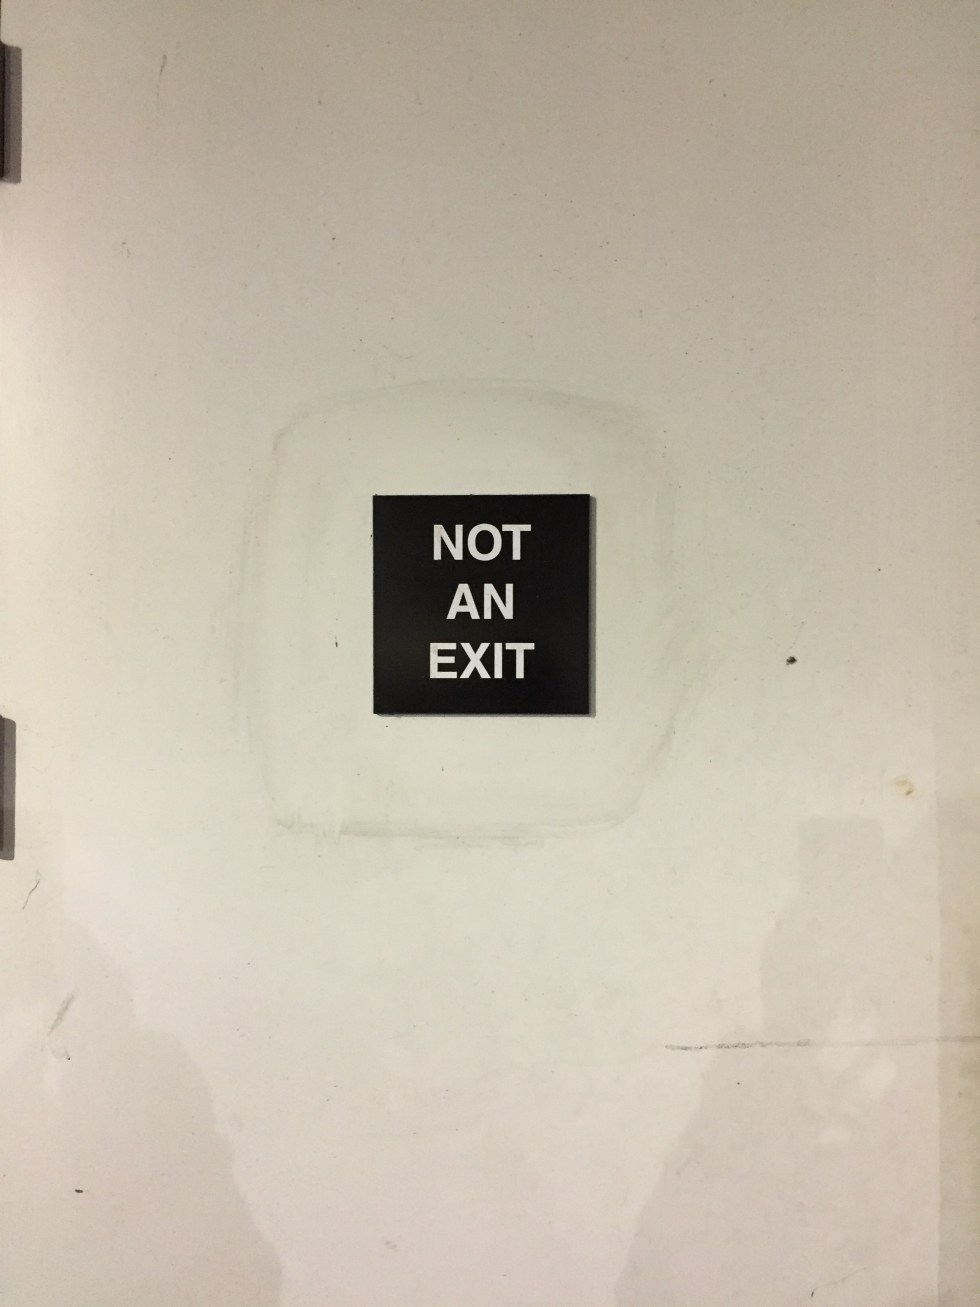 Not an Exit Photo by Michael J. Kramer